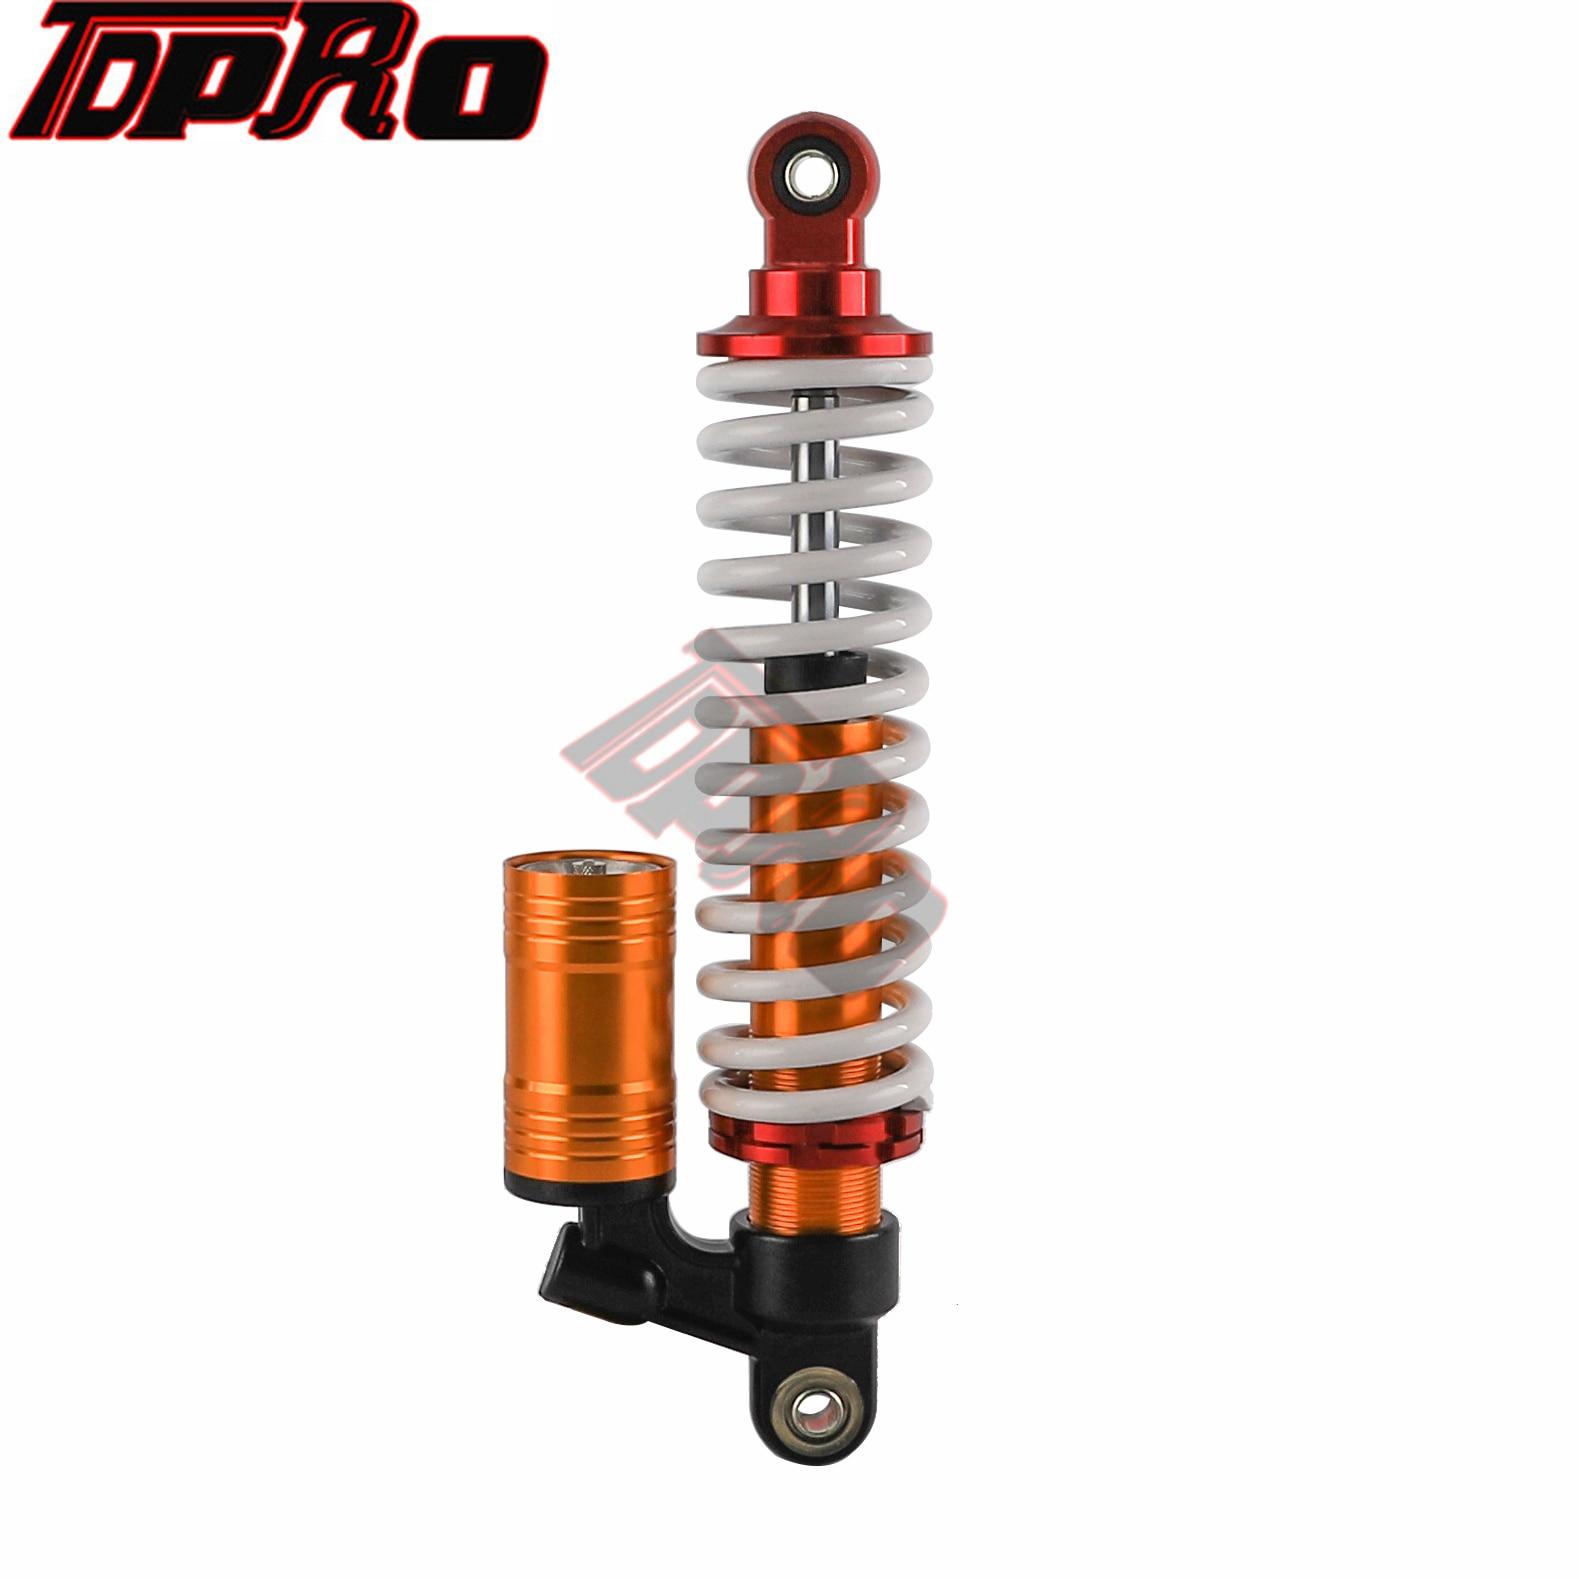 For Taotao Bull Quad 2* 290mm Front Shock 1* 270mm Rear Shock Quad Scooter ATV